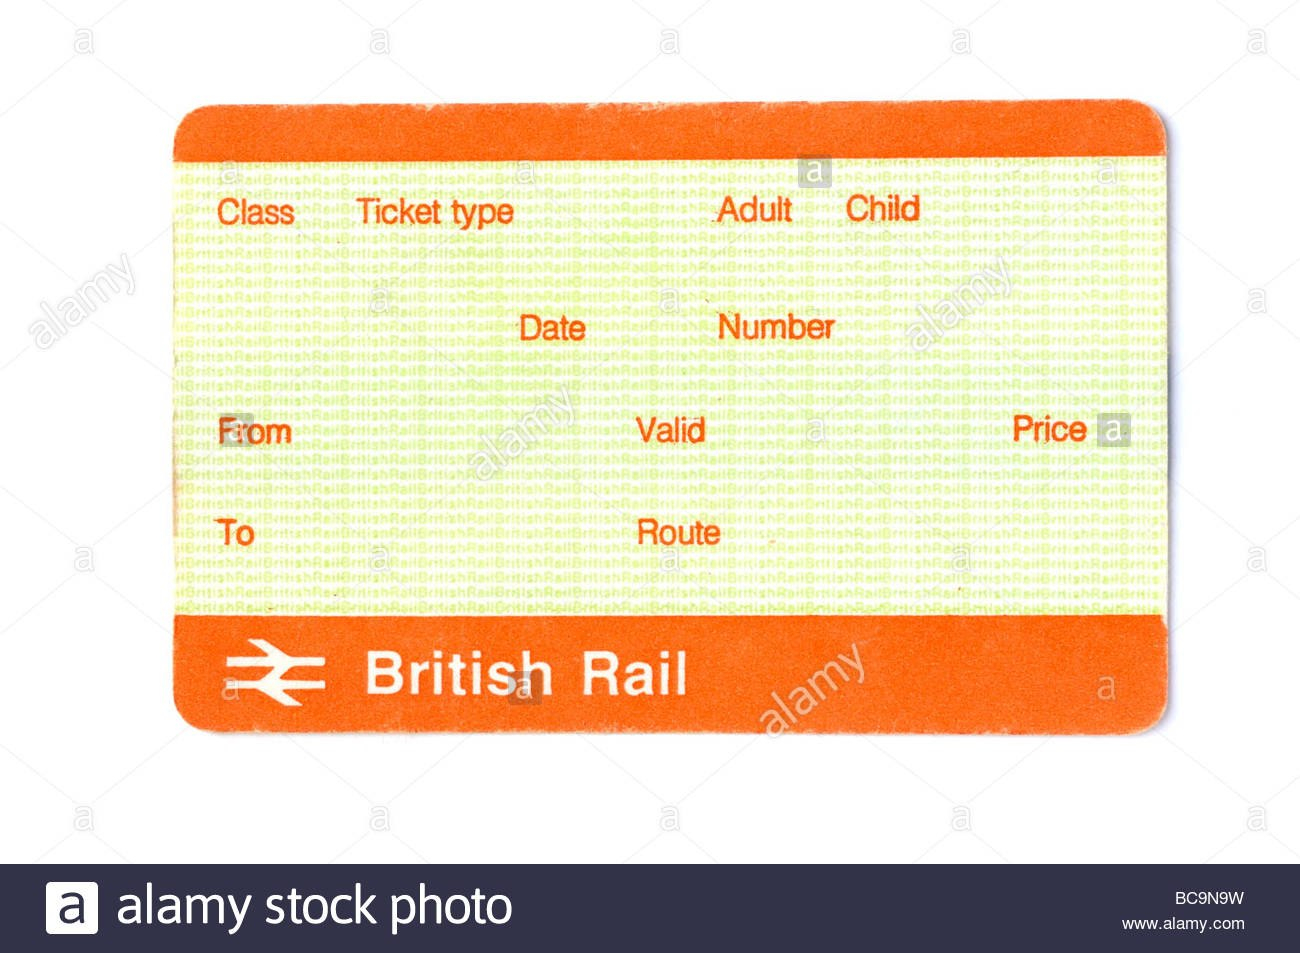 Train Ticket Blank Stock Photos  Train Ticket Blank Stock Images Pertaining To Blank Train Ticket Template